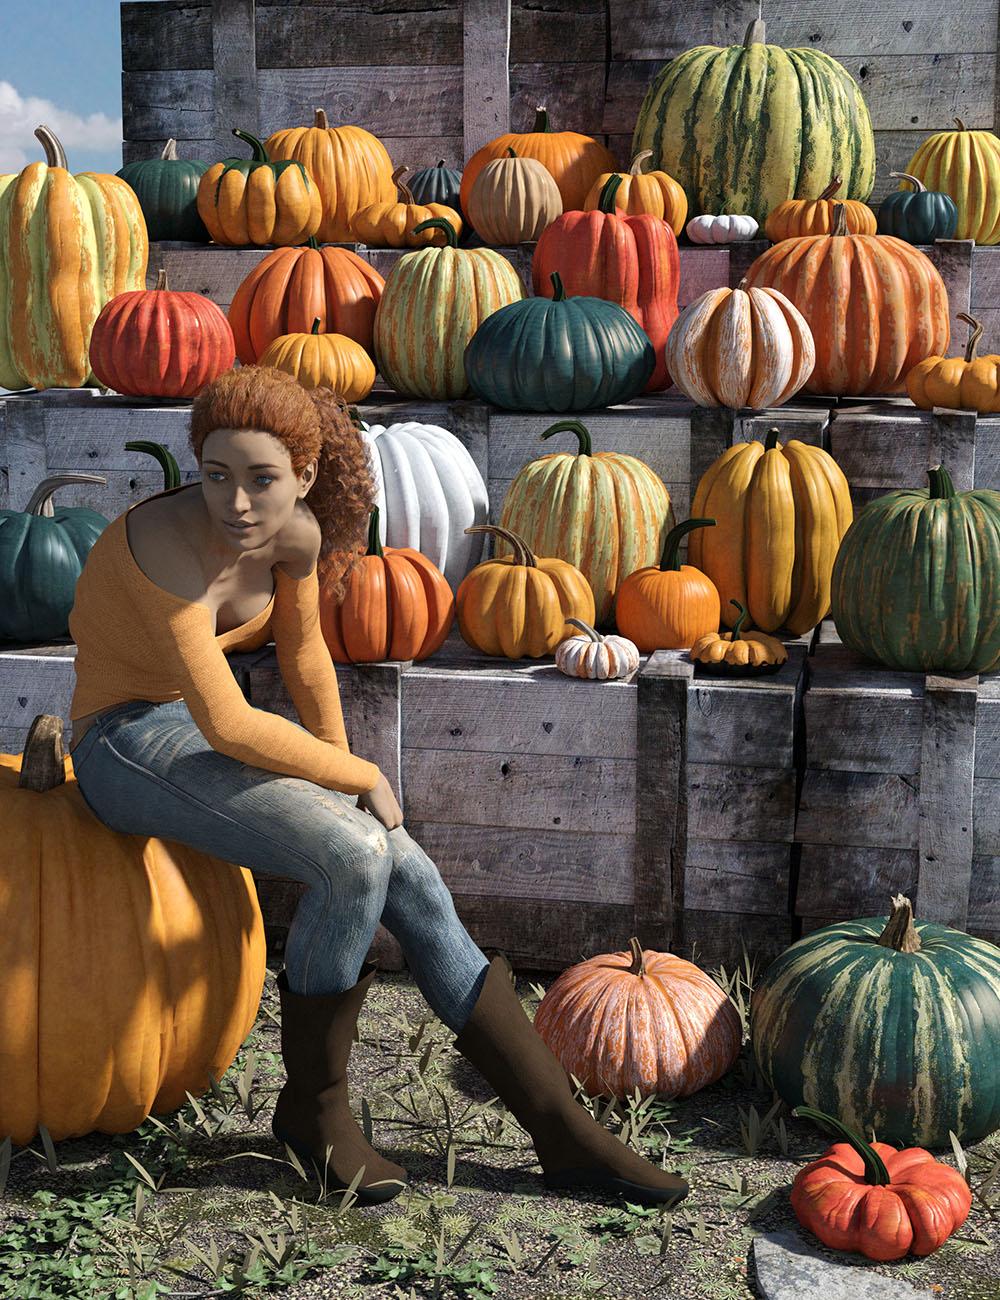 Epic Pumpkin Pack by: Orestes Graphics, 3D Models by Daz 3D